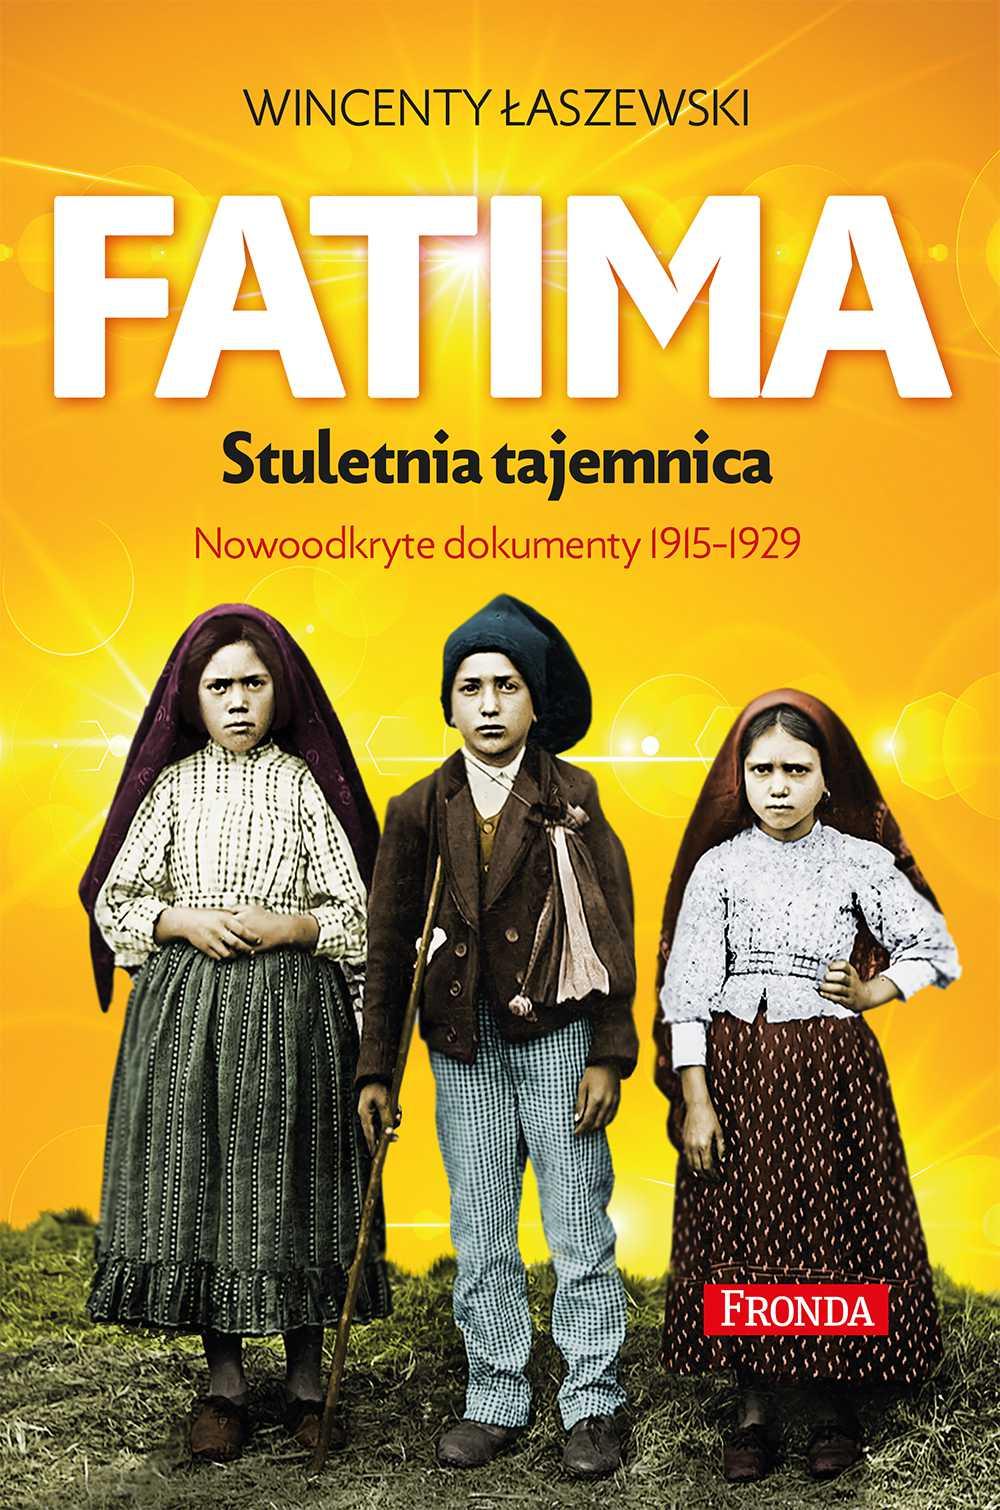 Fatima - Ebook (Książka na Kindle) do pobrania w formacie MOBI